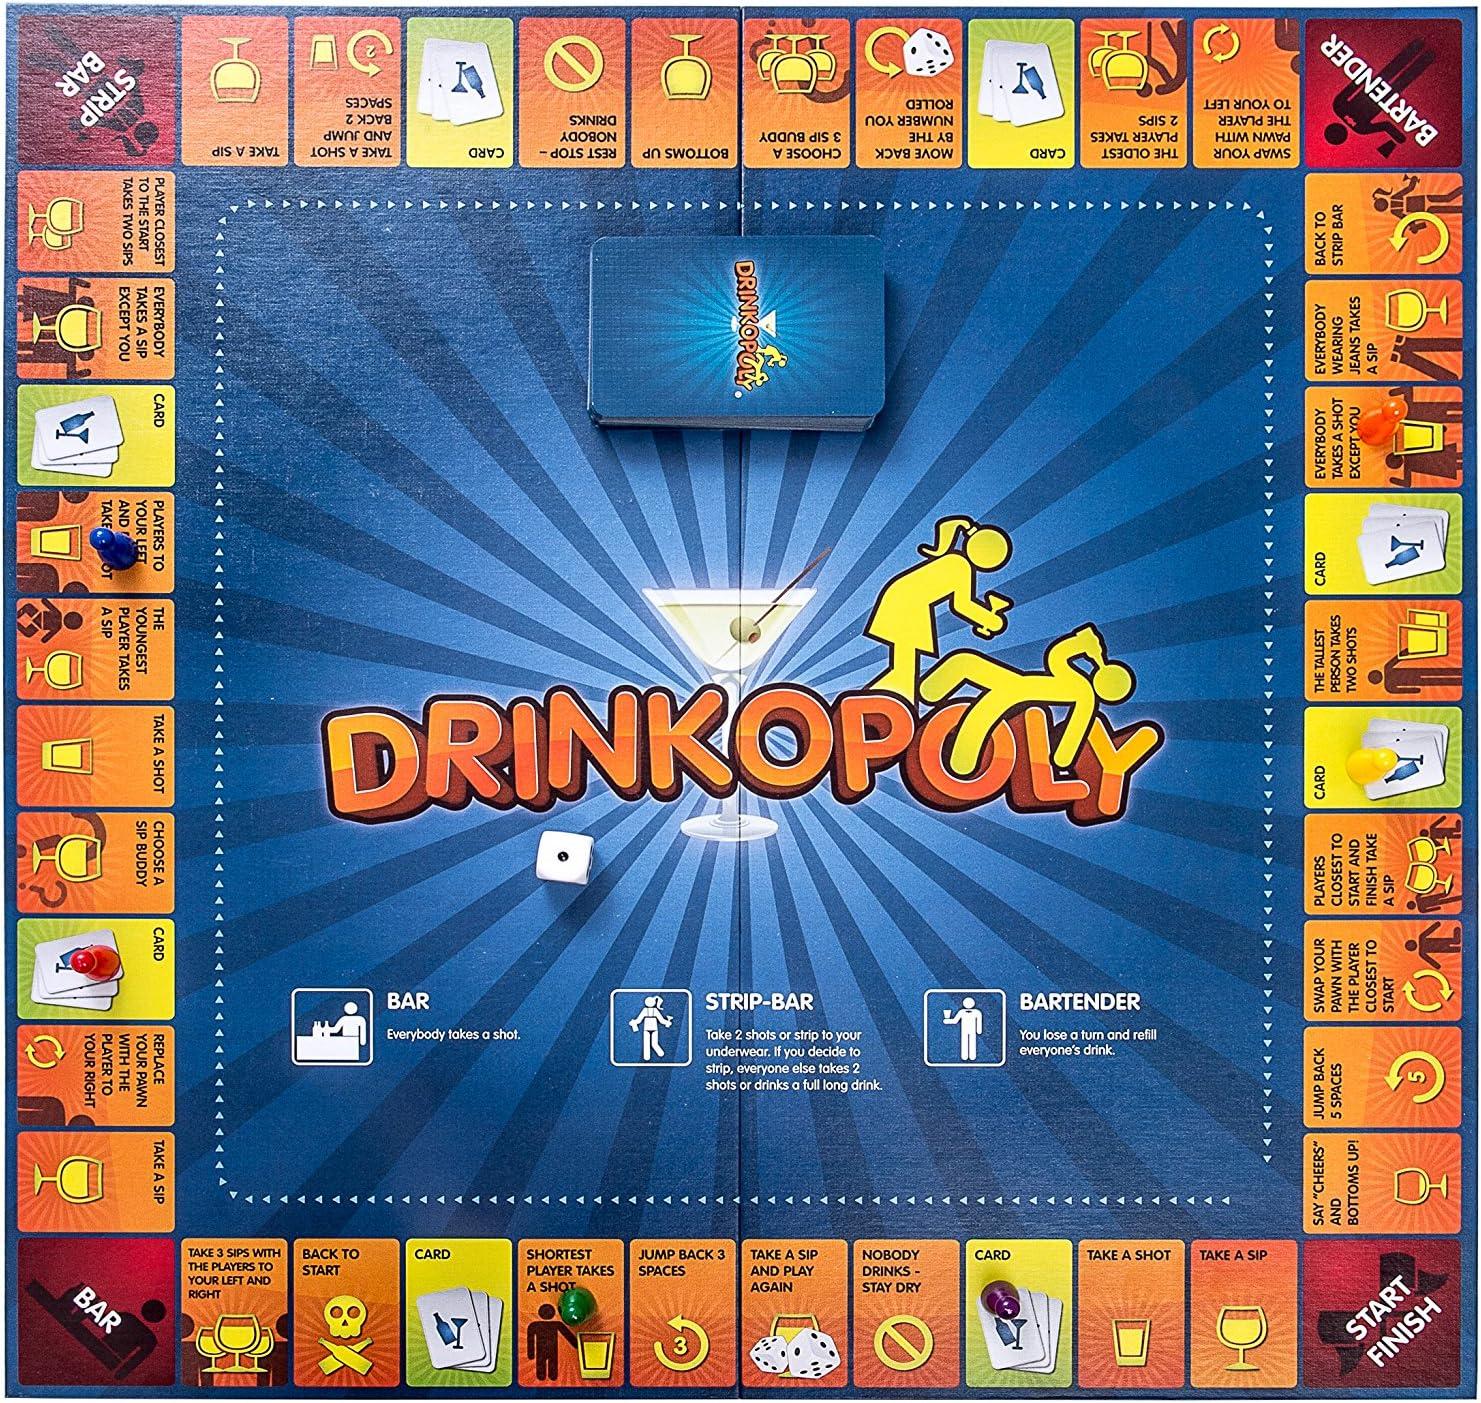 Drinkopoly Board Game-adulte fête jeu-drinking game drinkopoly CRZ497019